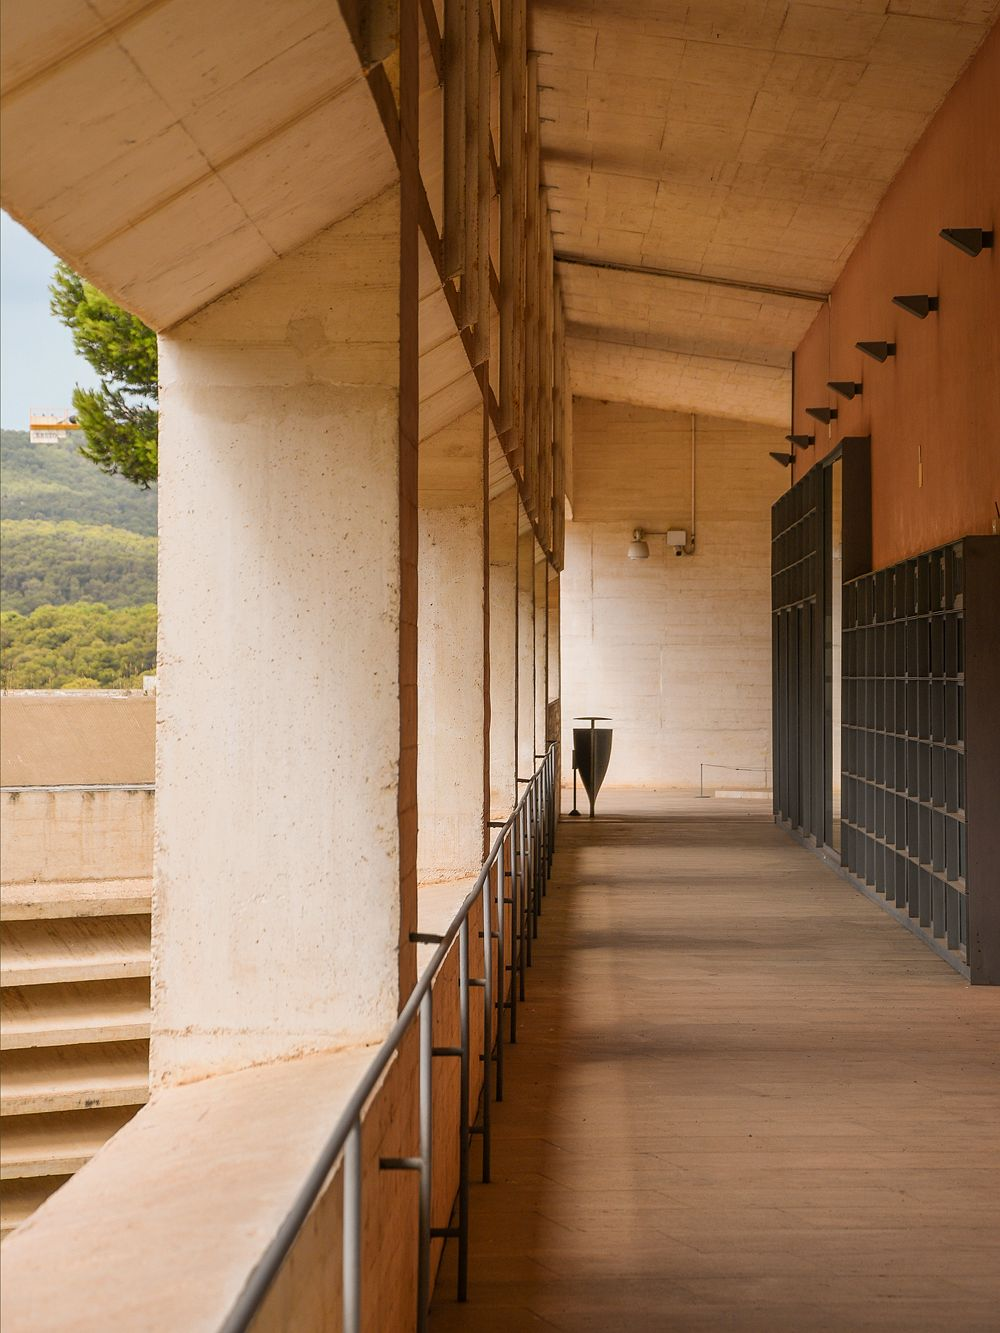 Moneo-rakennus, Palma de Mallorca